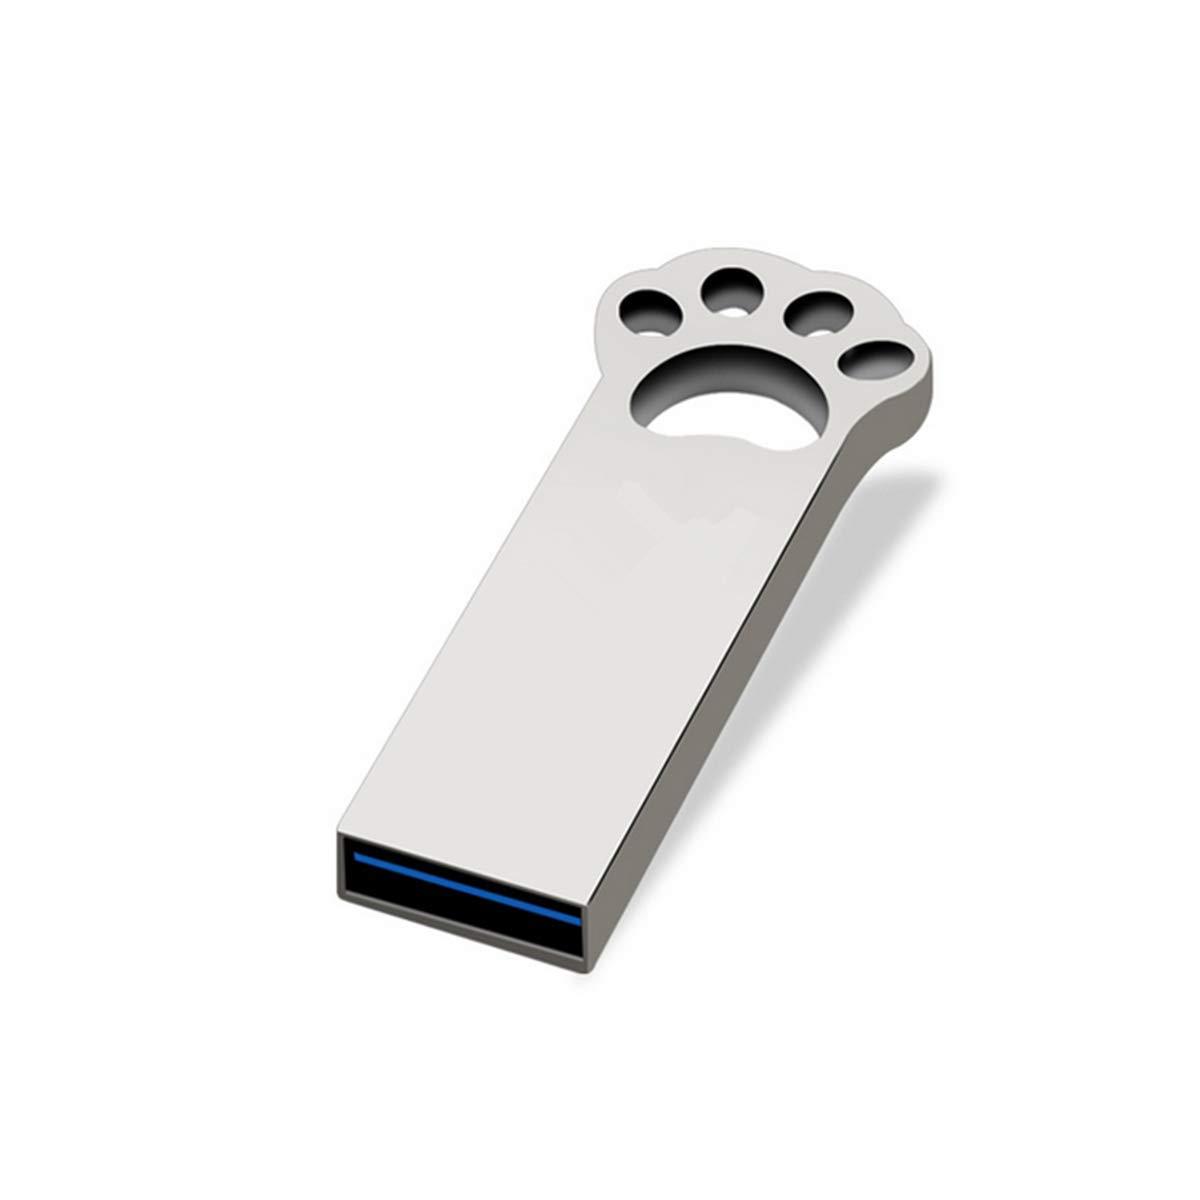 FeliSun Memoria Flash USB 3.0 16 GB 32GB 64GB,Unidad Flash USB 3.0 con Llavero,Metal Tarjeta de Memoria U Disk Memoria USB Regalo Creativo (16GB)